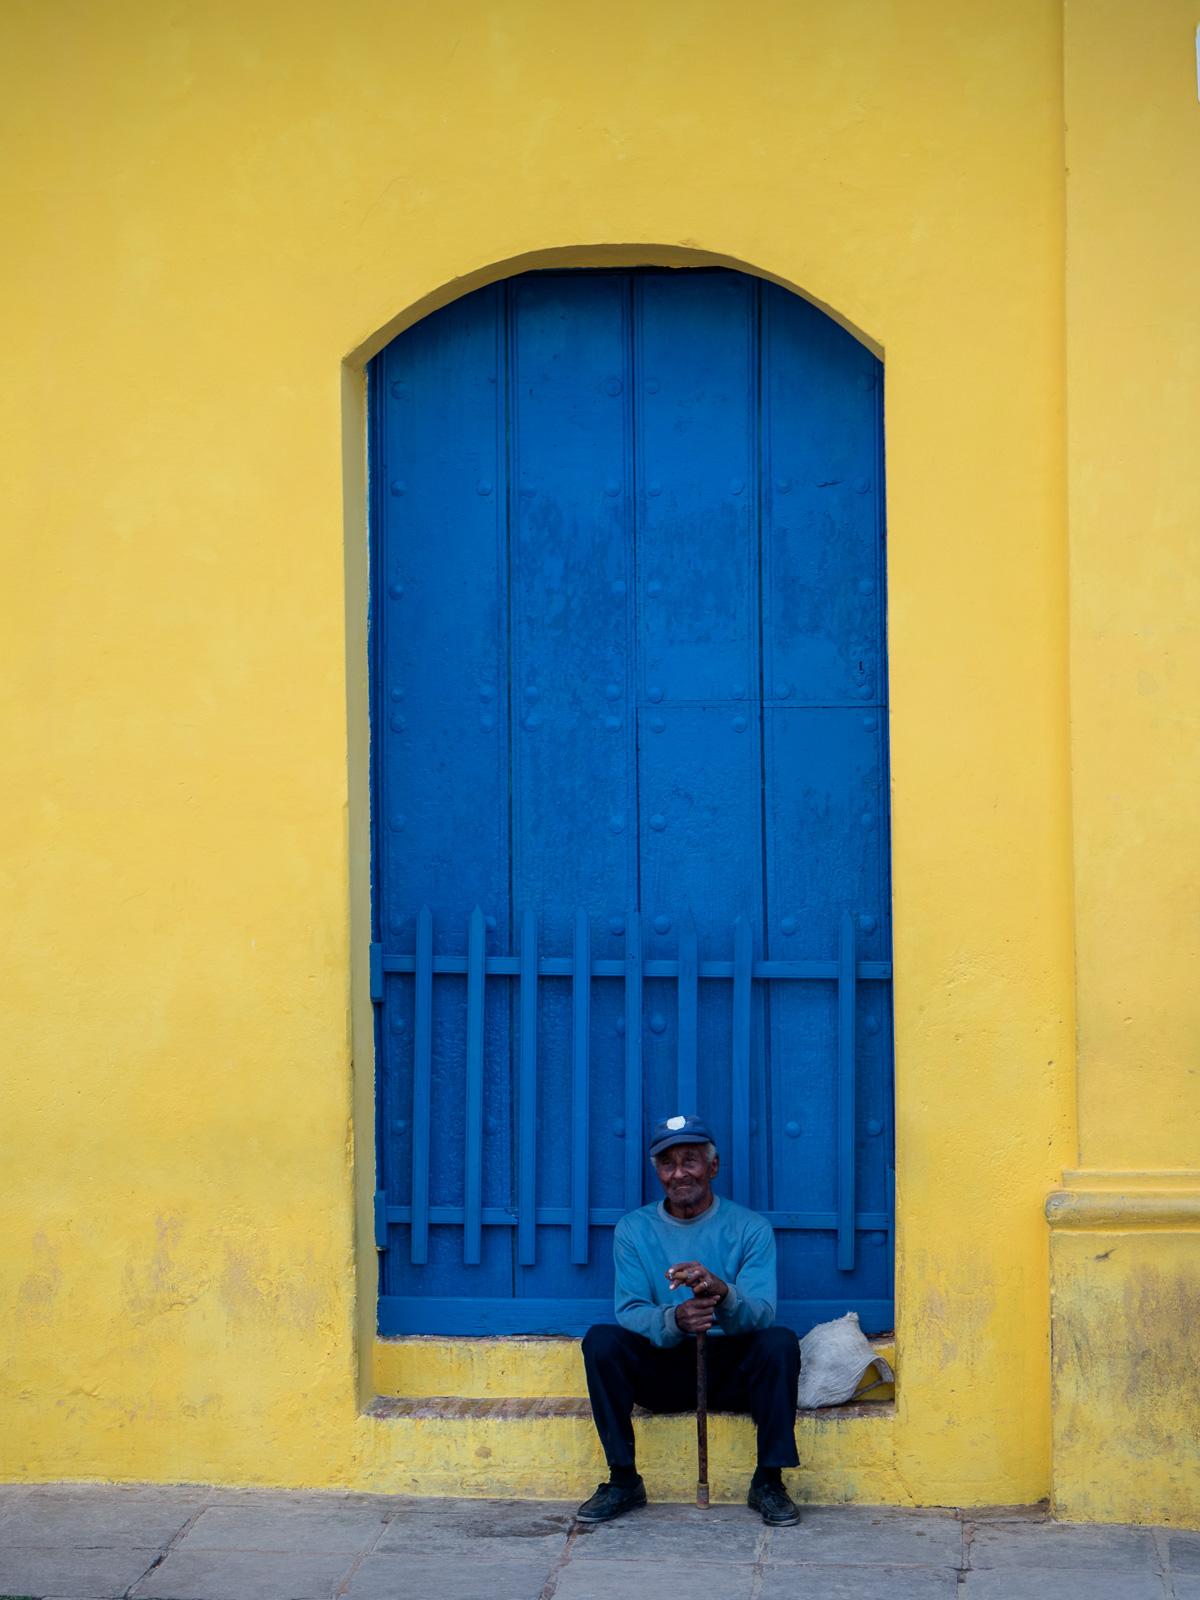 Kuba Reiseroute Teil 1 - https://kuechenchaotin.de